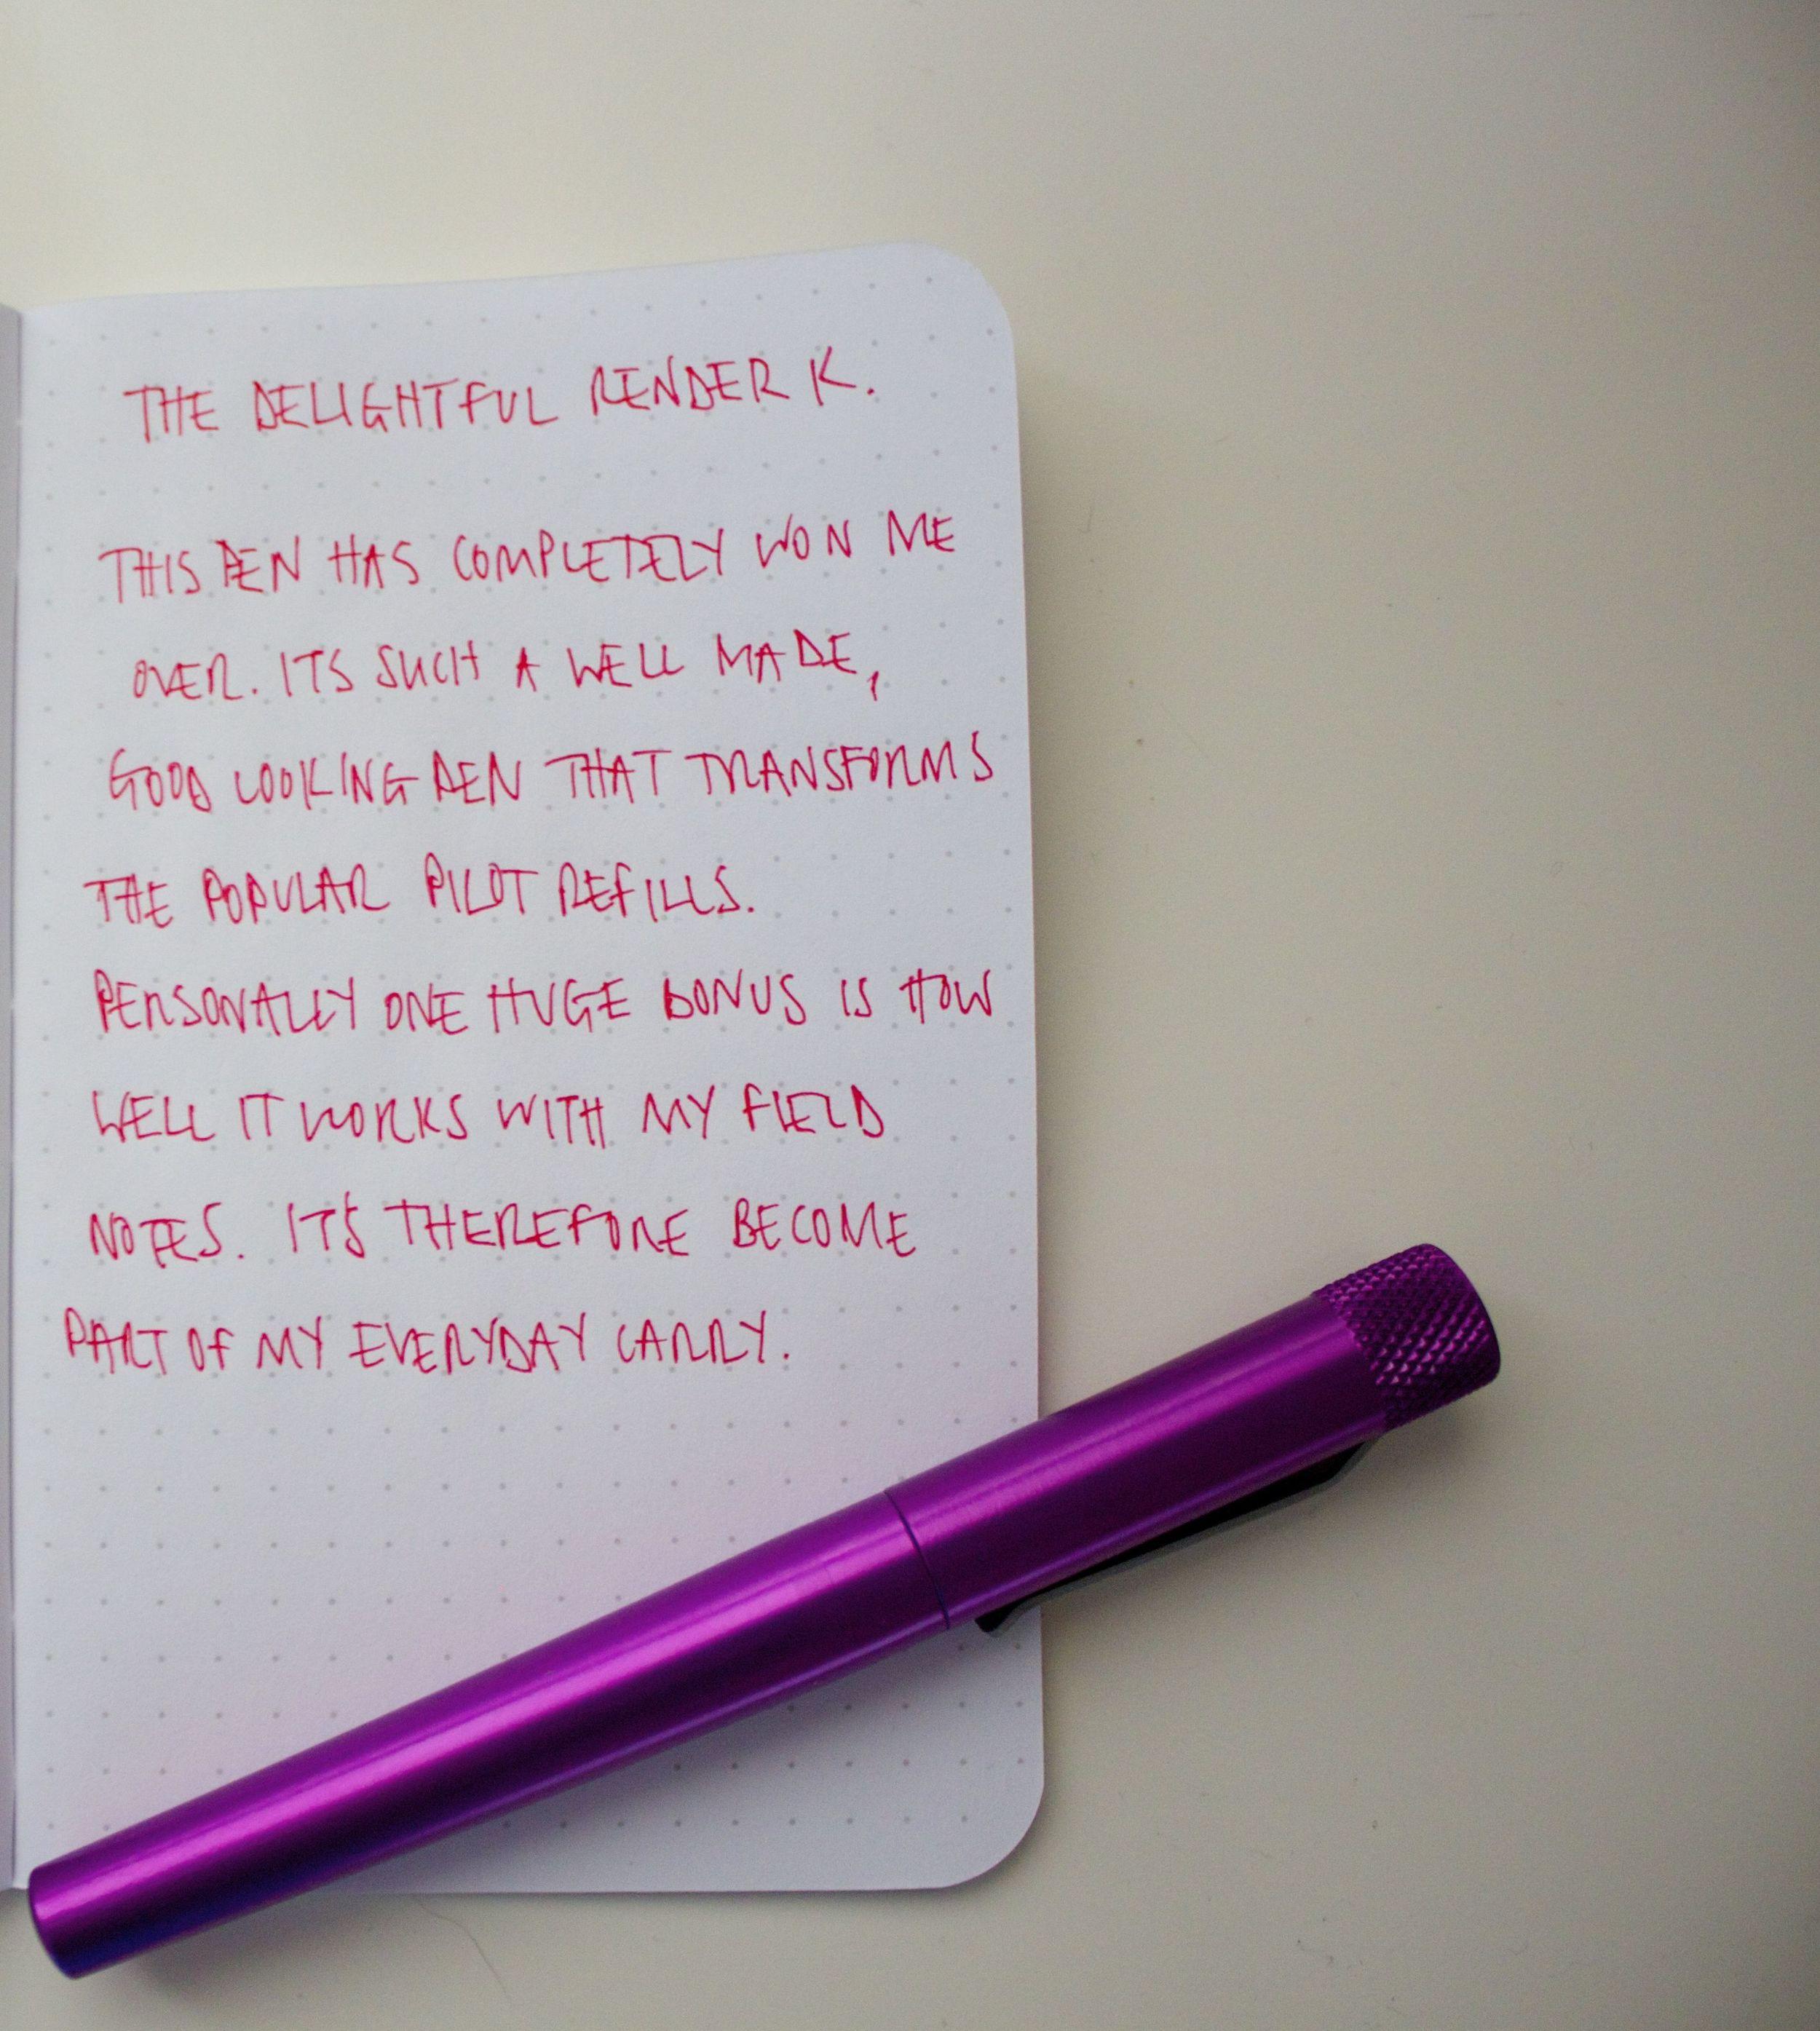 Render K handwritten in my Field Notes of course